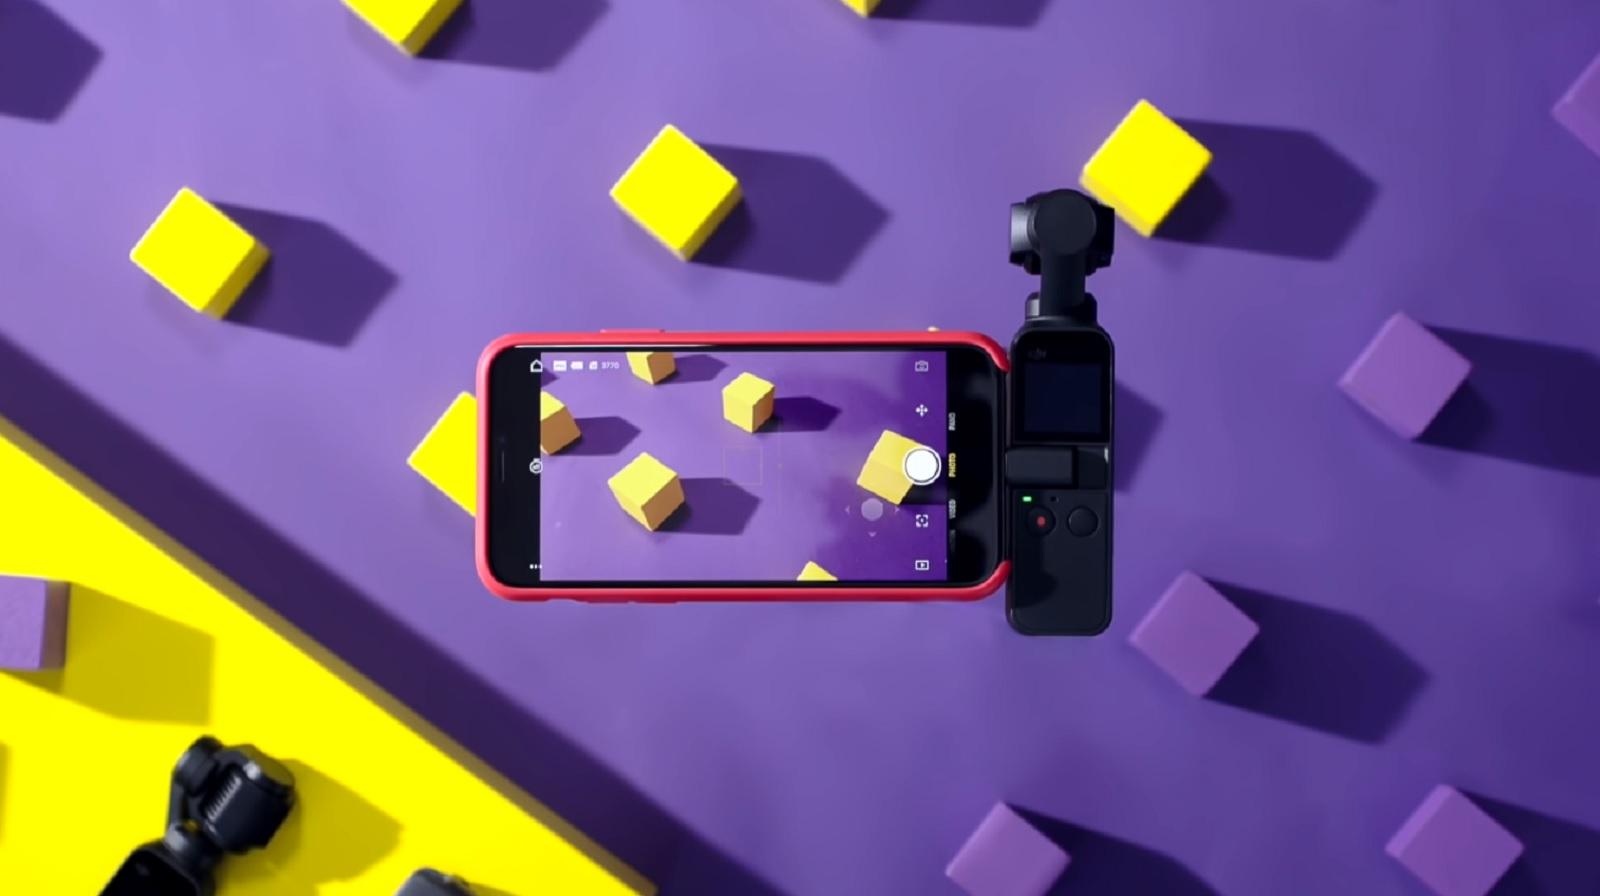 Обновление прошивки DJI Osmo Pocket – v01.10.00.30